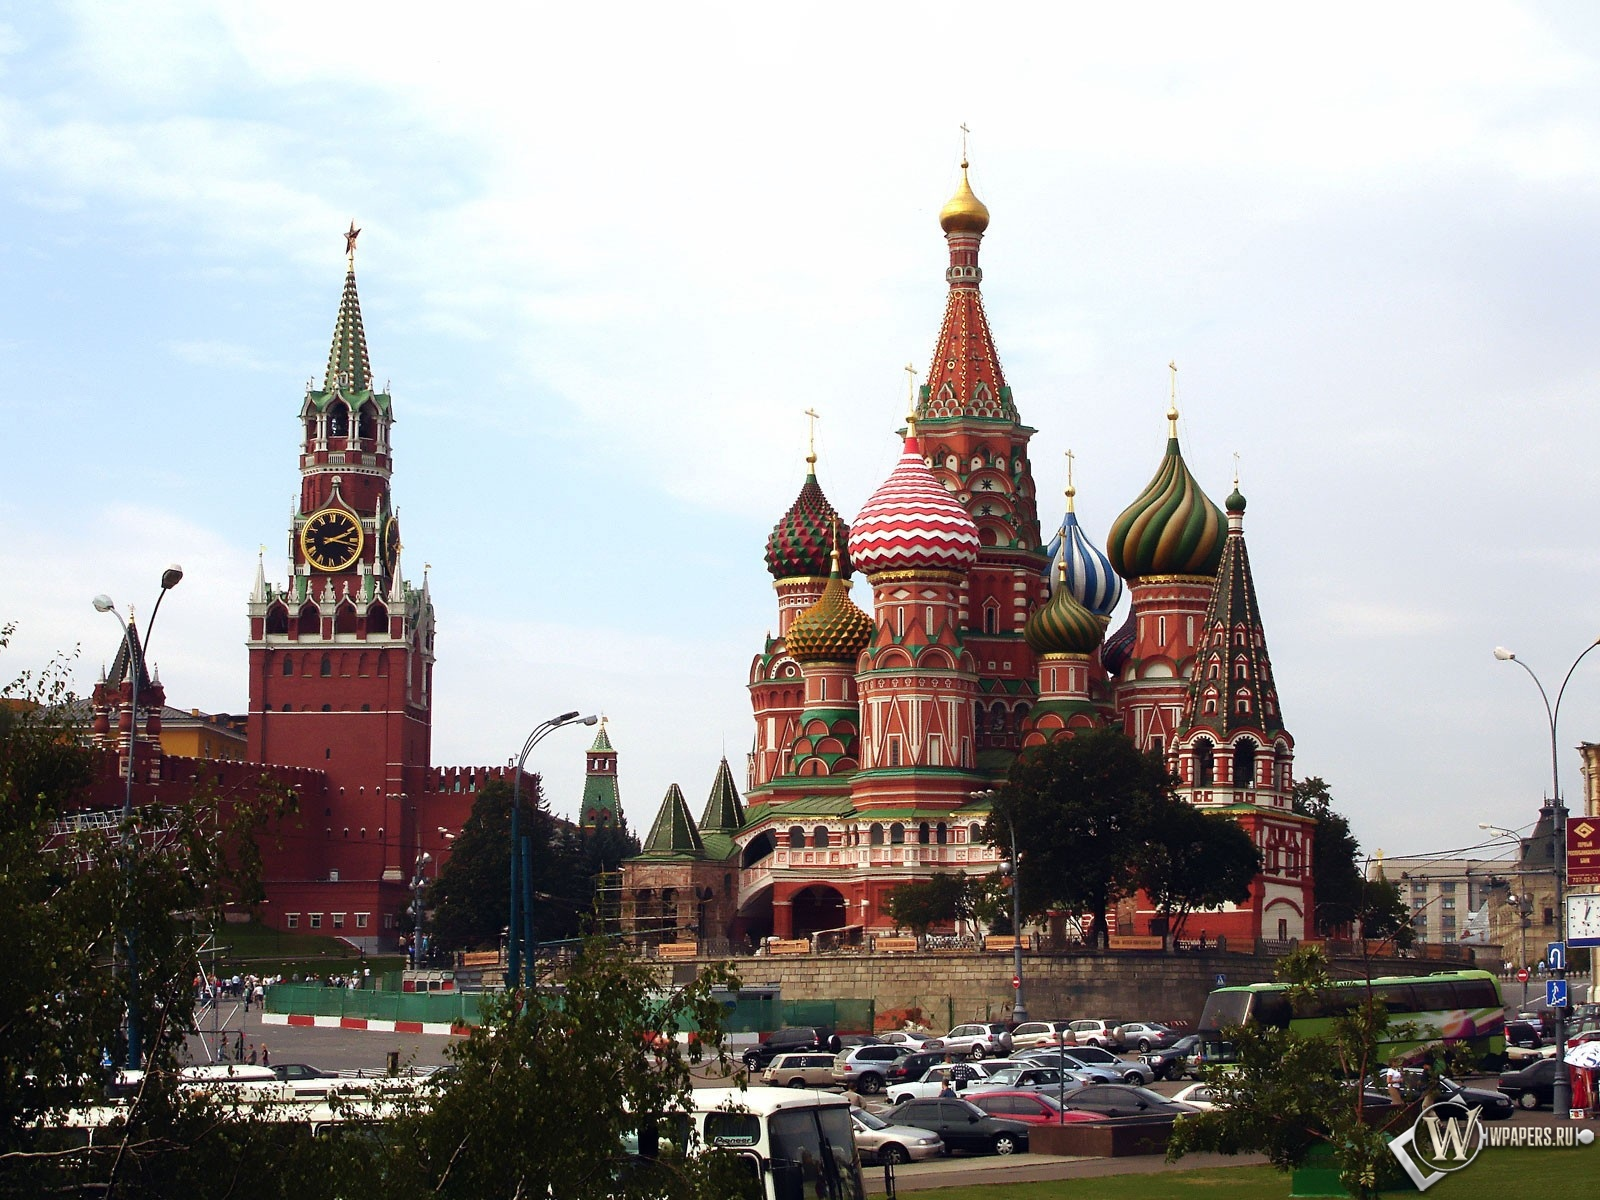 Московский кремль 1600x1200